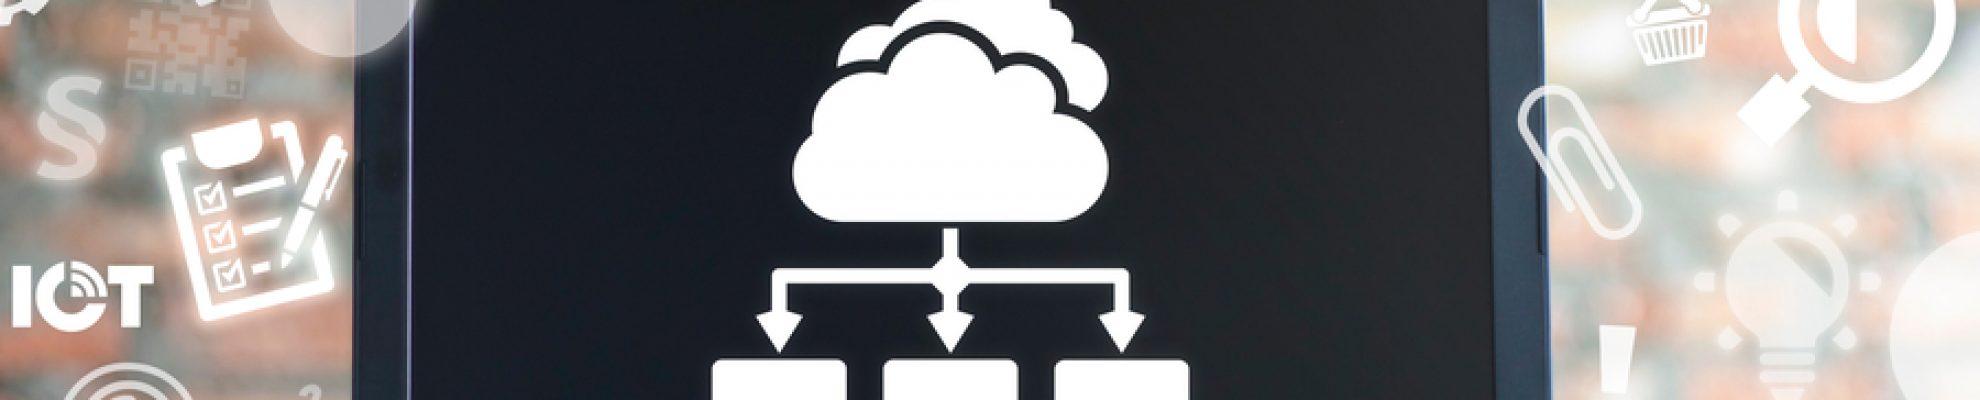 avantage cloud